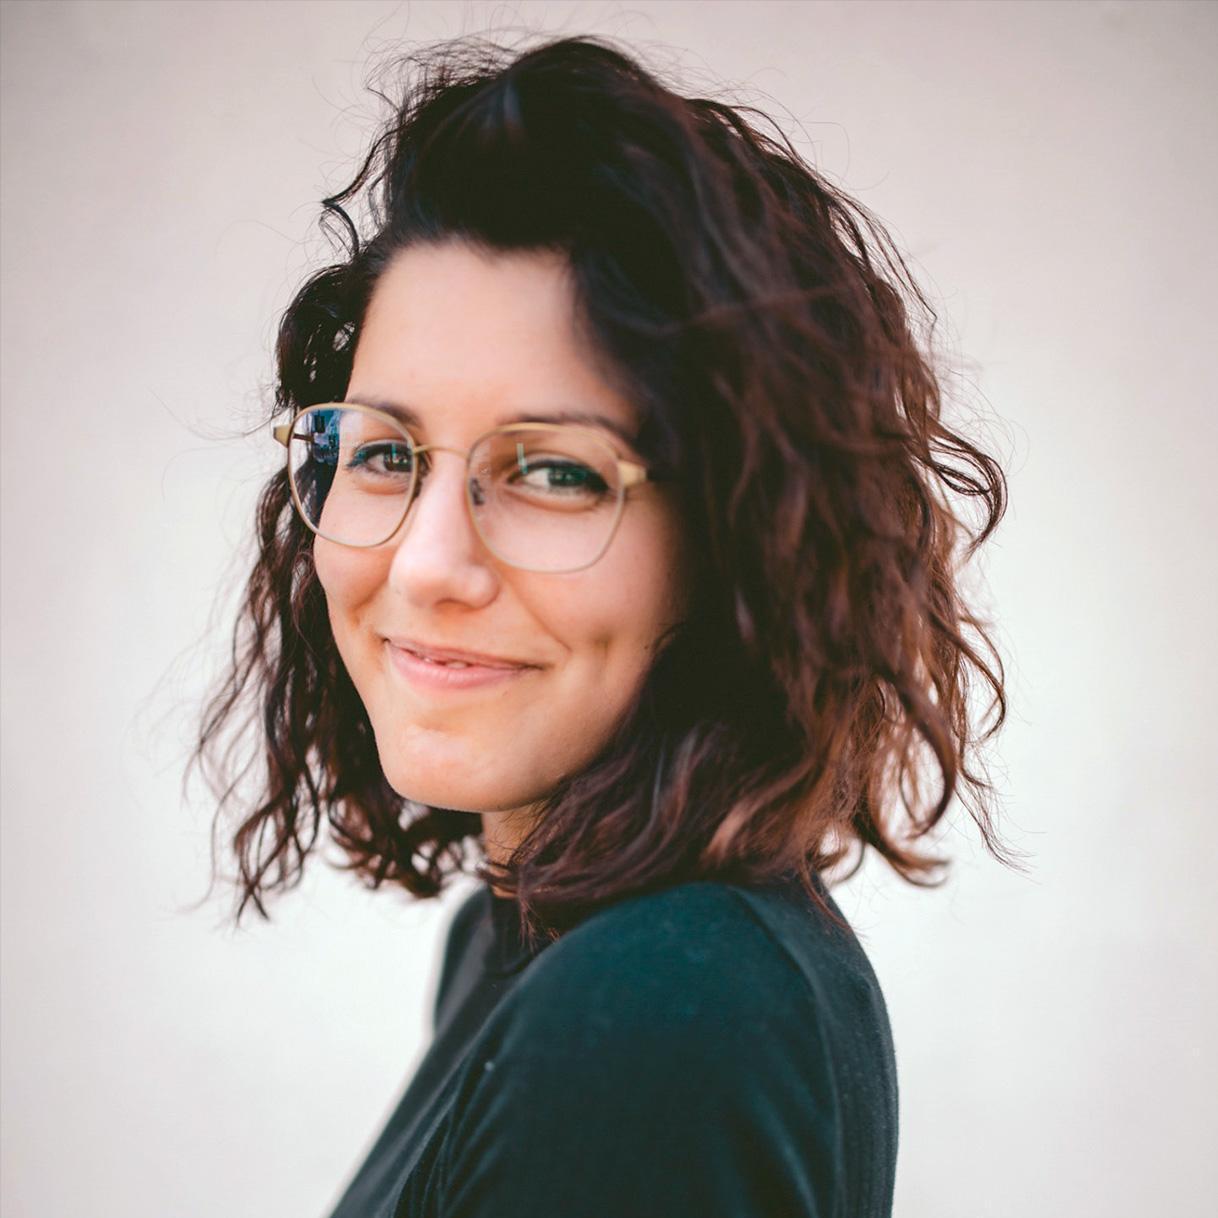 Silvia Rovira Profile, news, ratings and communication